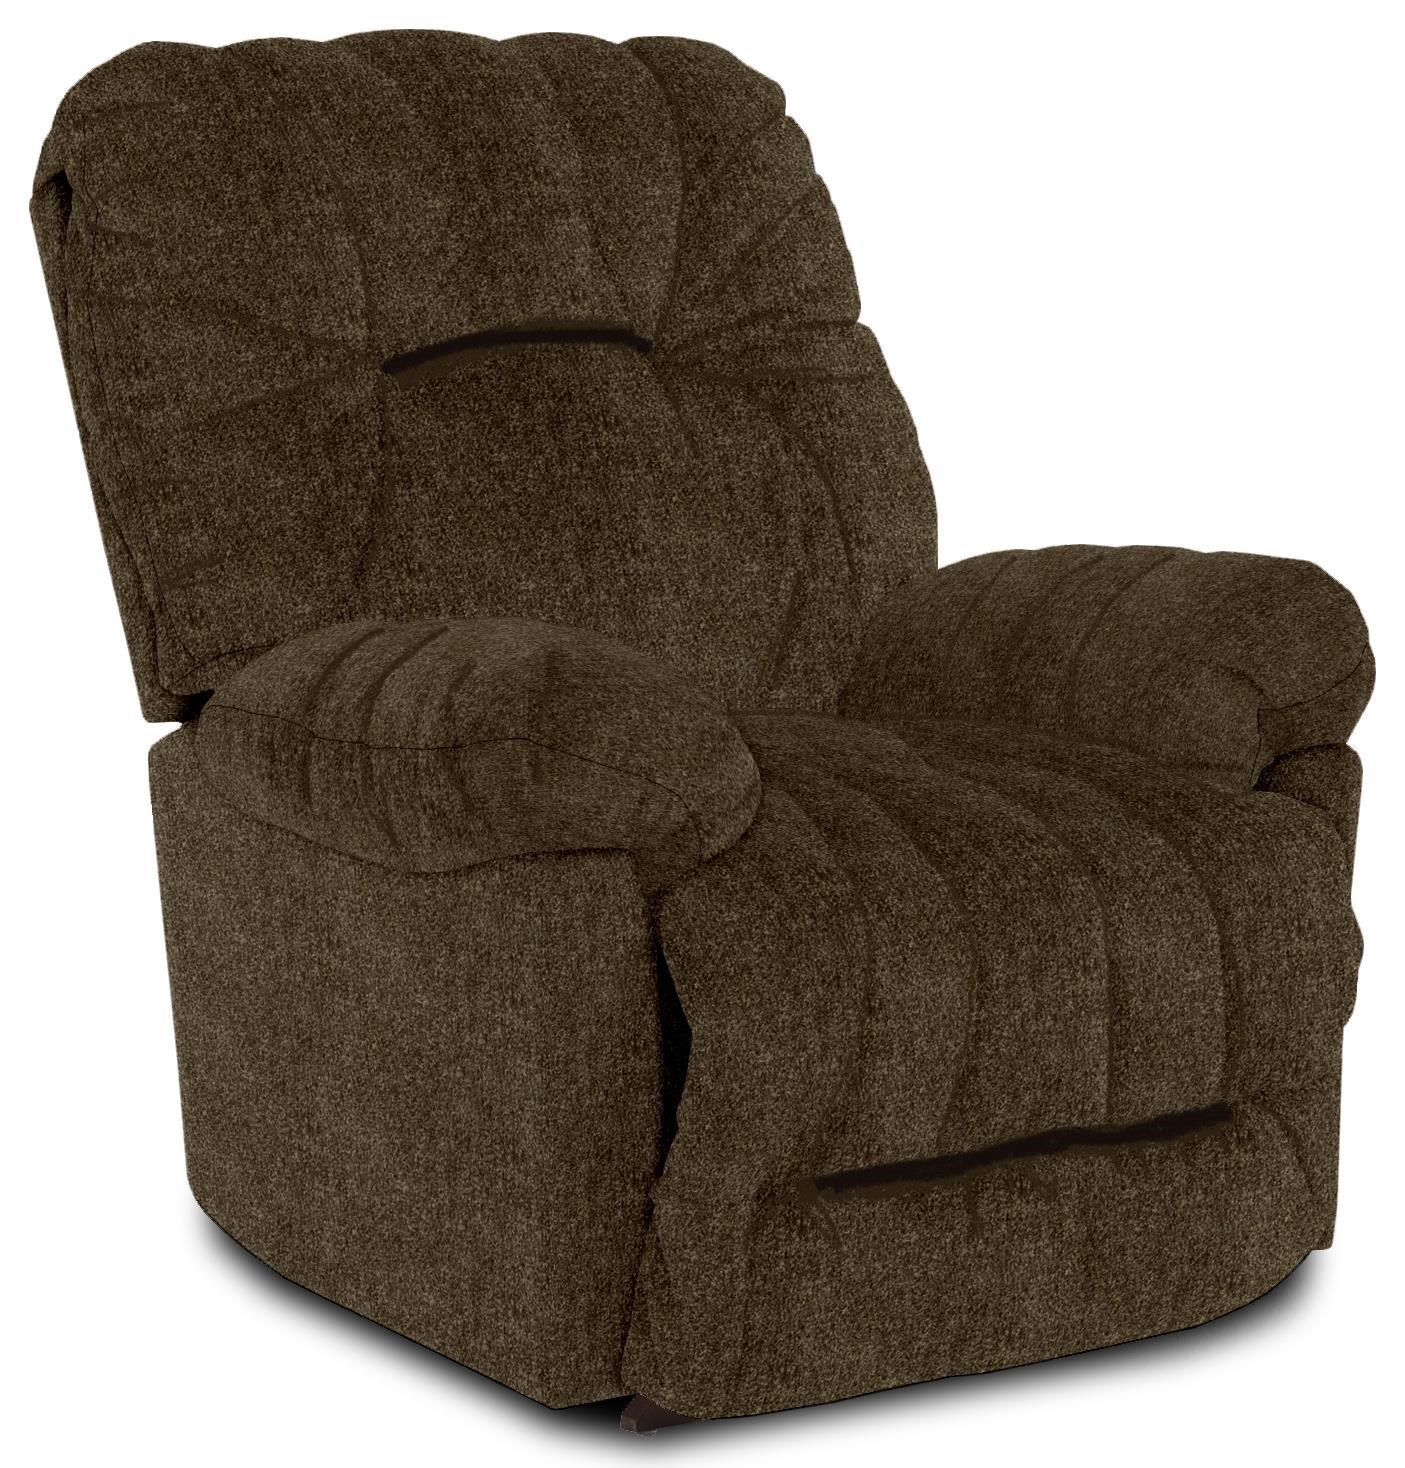 Homerun Power Headrest Rocking Recliner by Best Home Furnishings at Crowley Furniture & Mattress